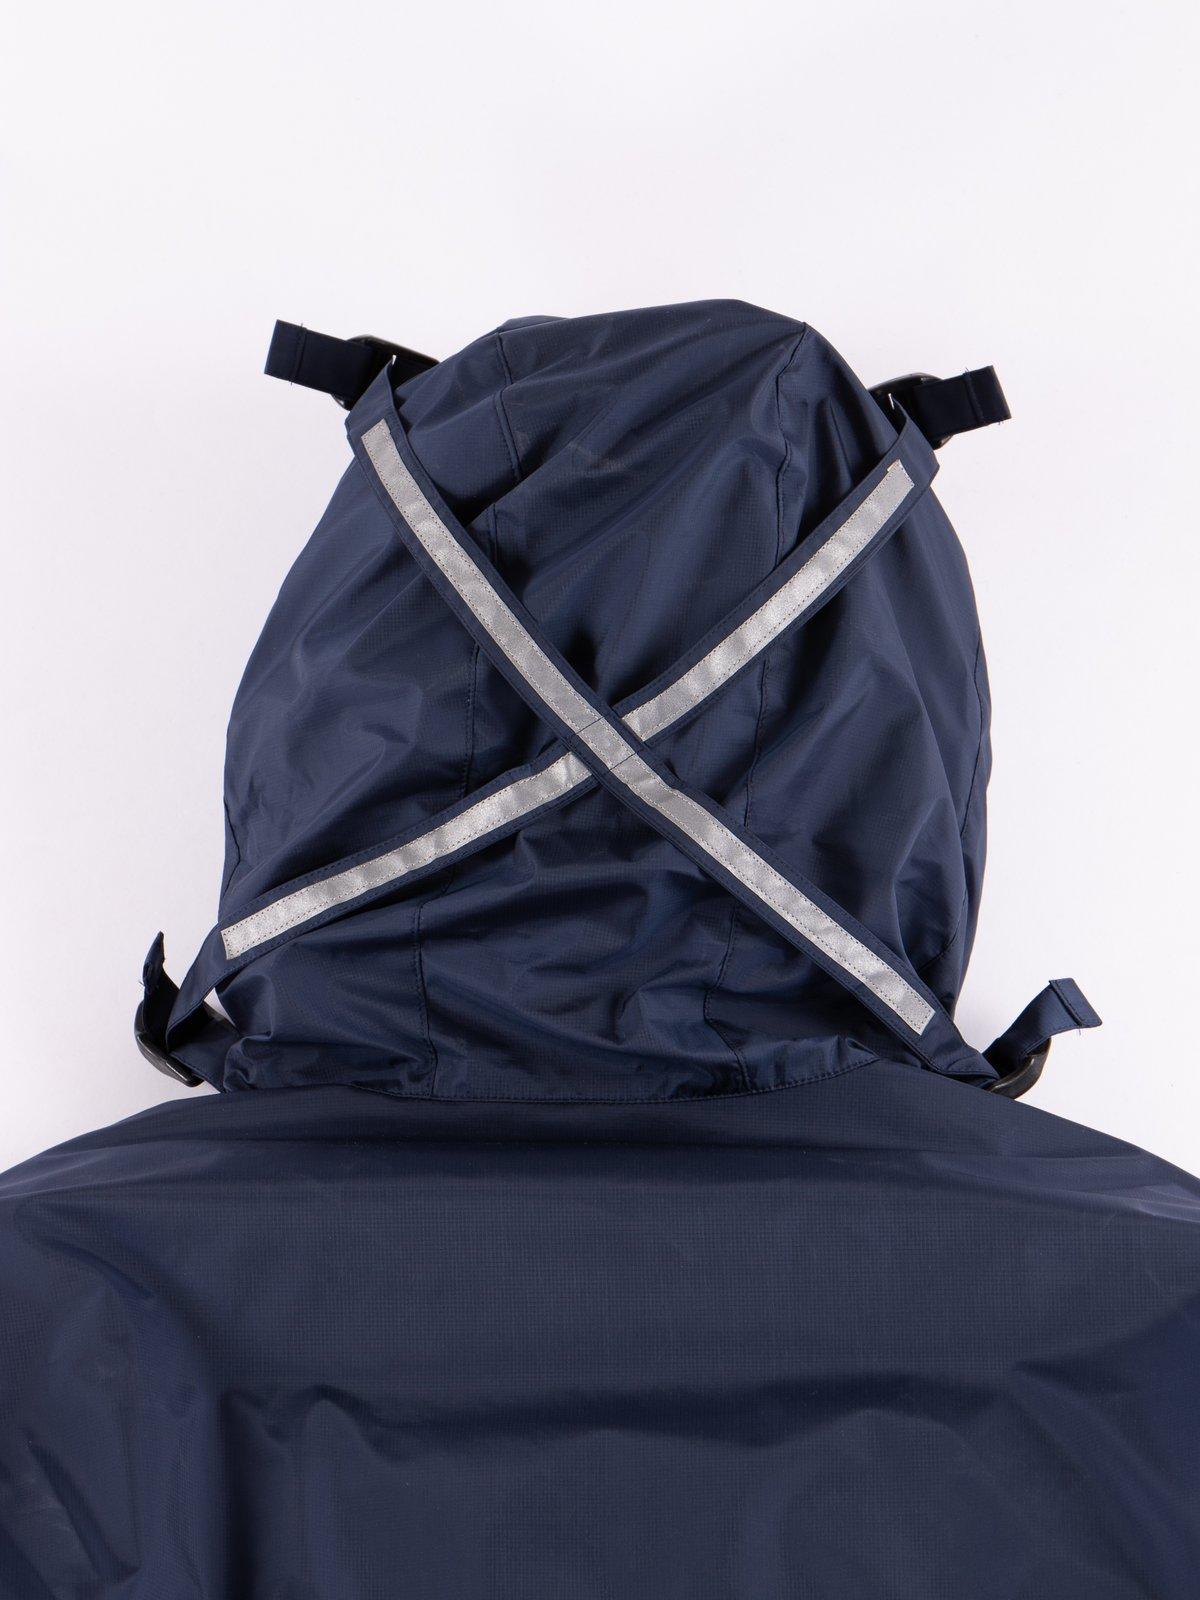 Navy/Blue Arktikal Down Jacket - Image 7